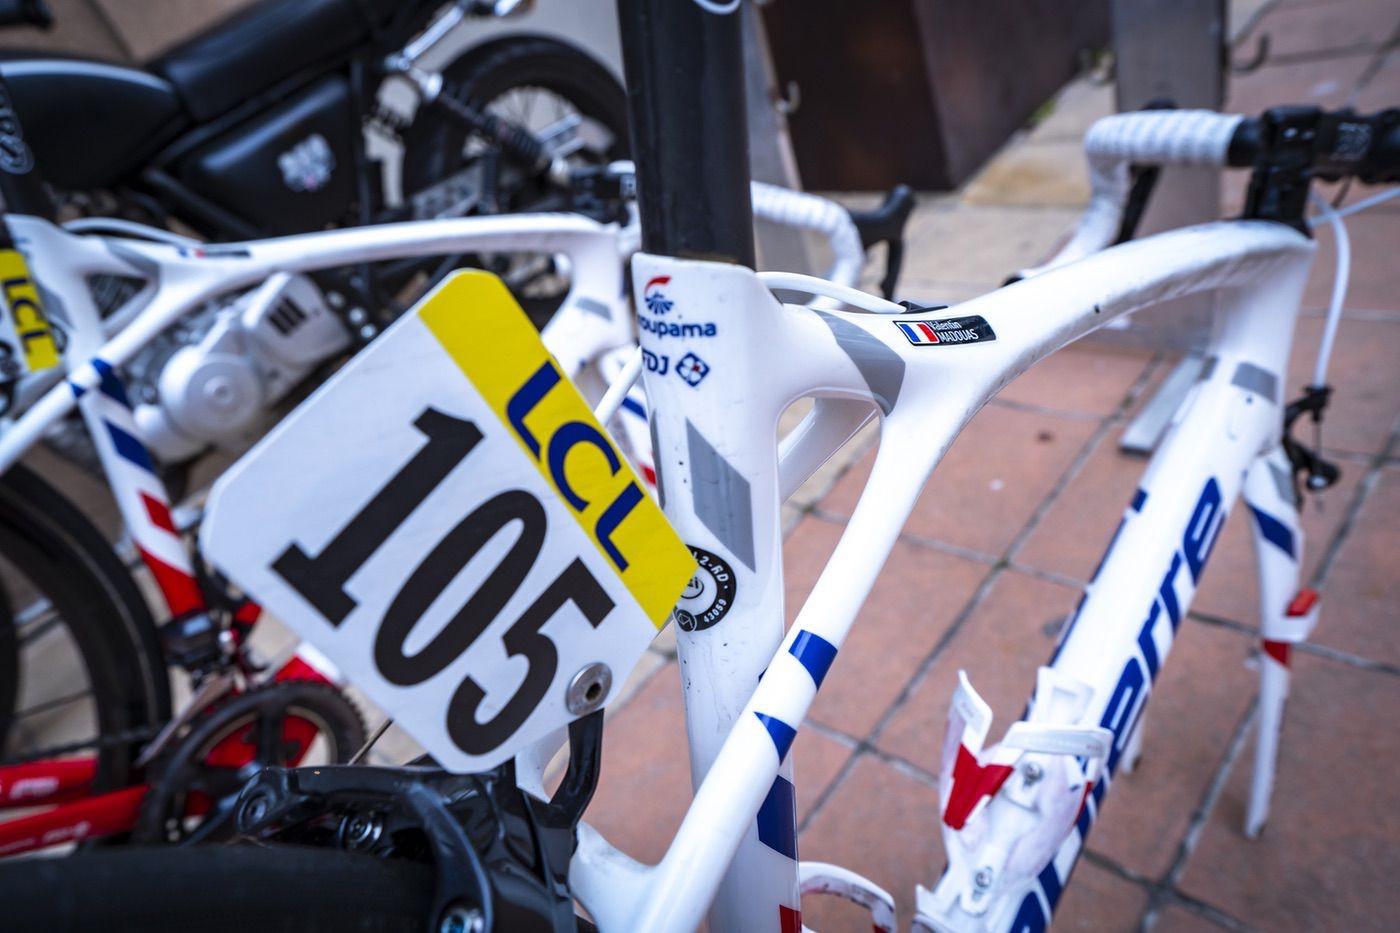 Bicicleta de carretera de competición del Groupama - FDJ